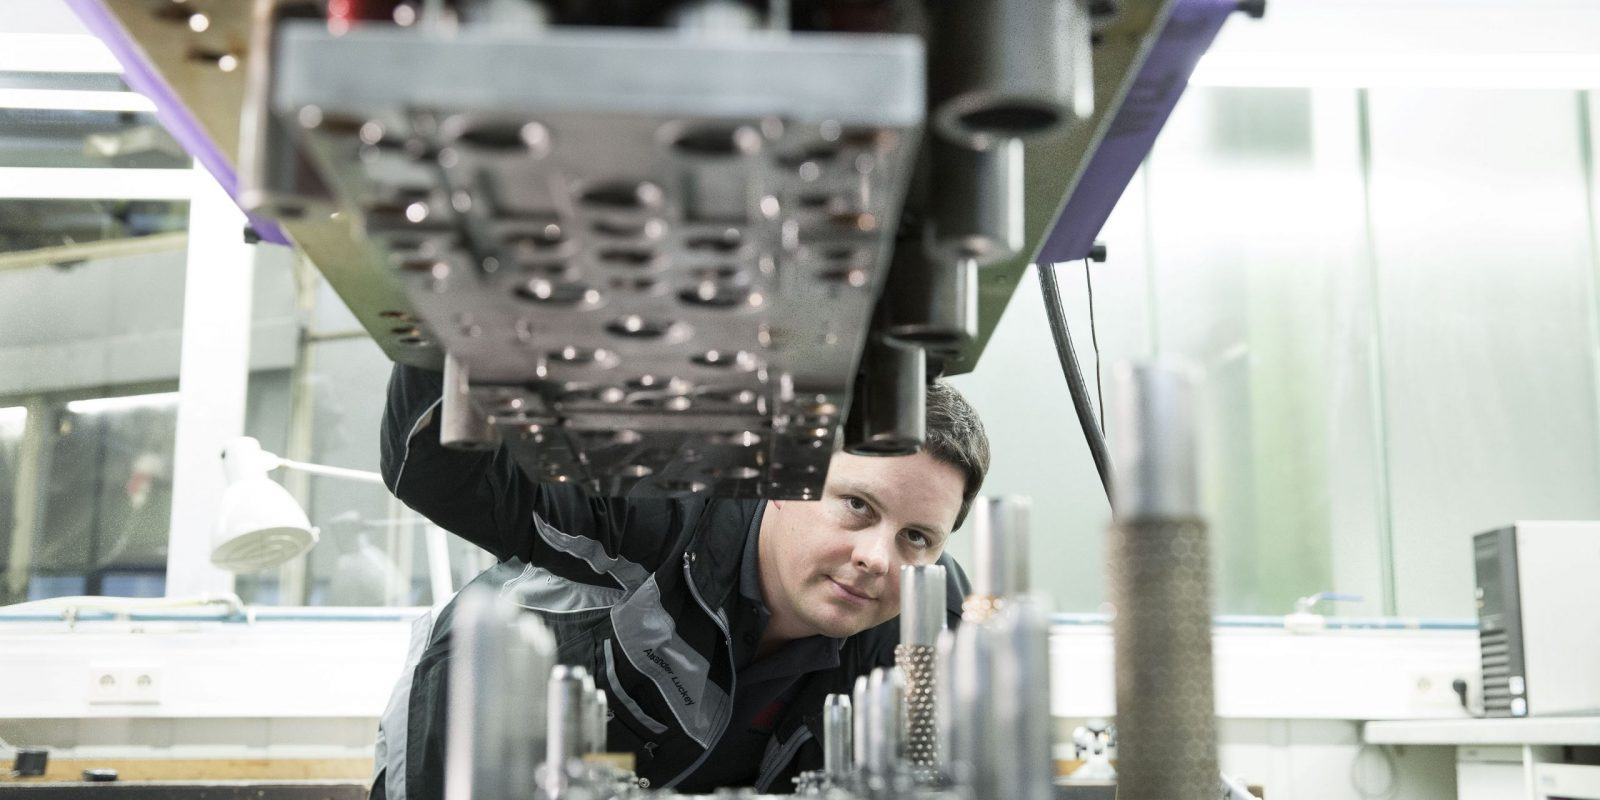 H&T Batteries | Development & Prototyping